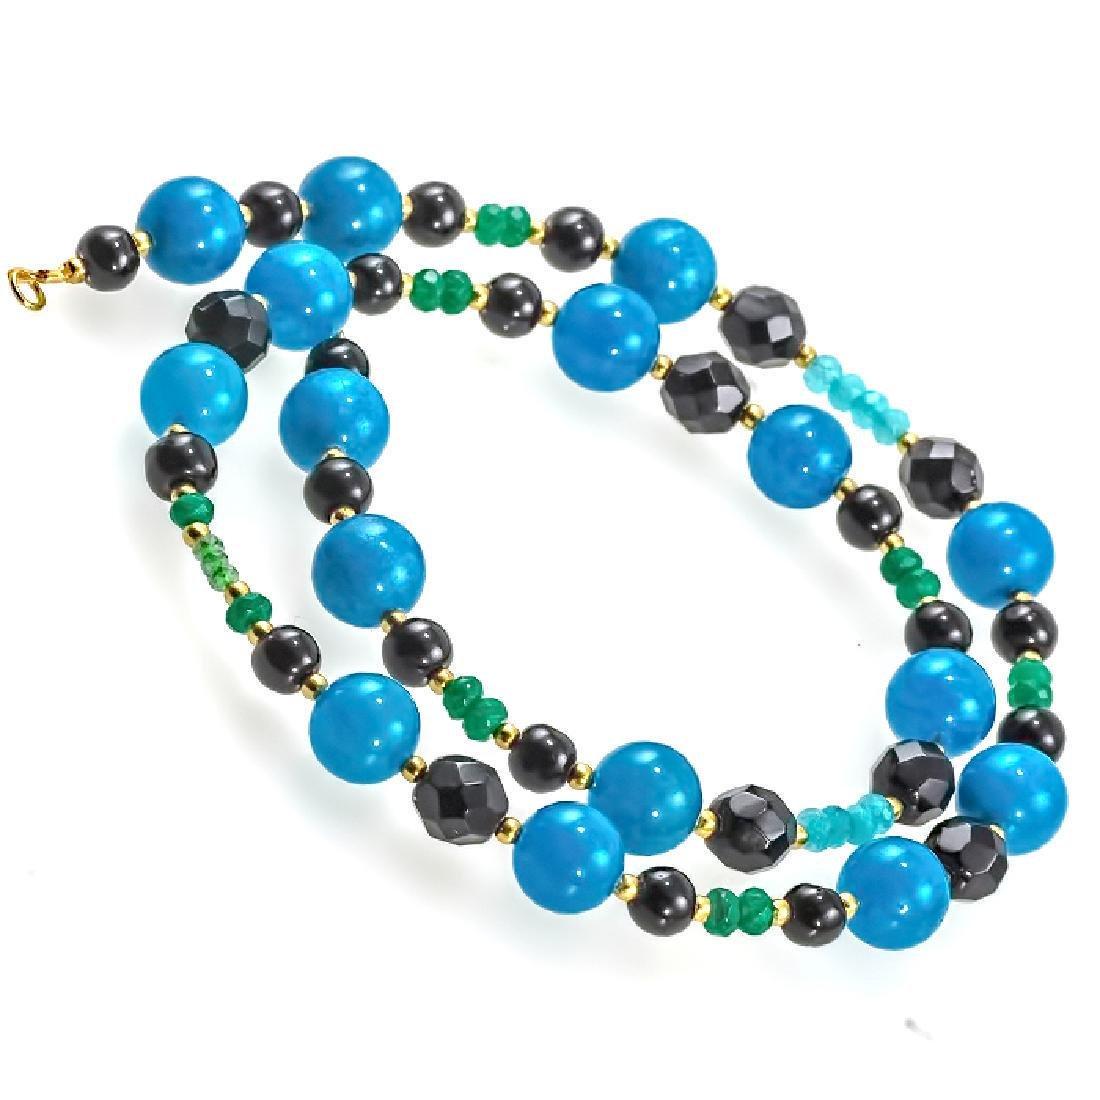 Jade Necklace with Emeralds, Aquamarine, Black and